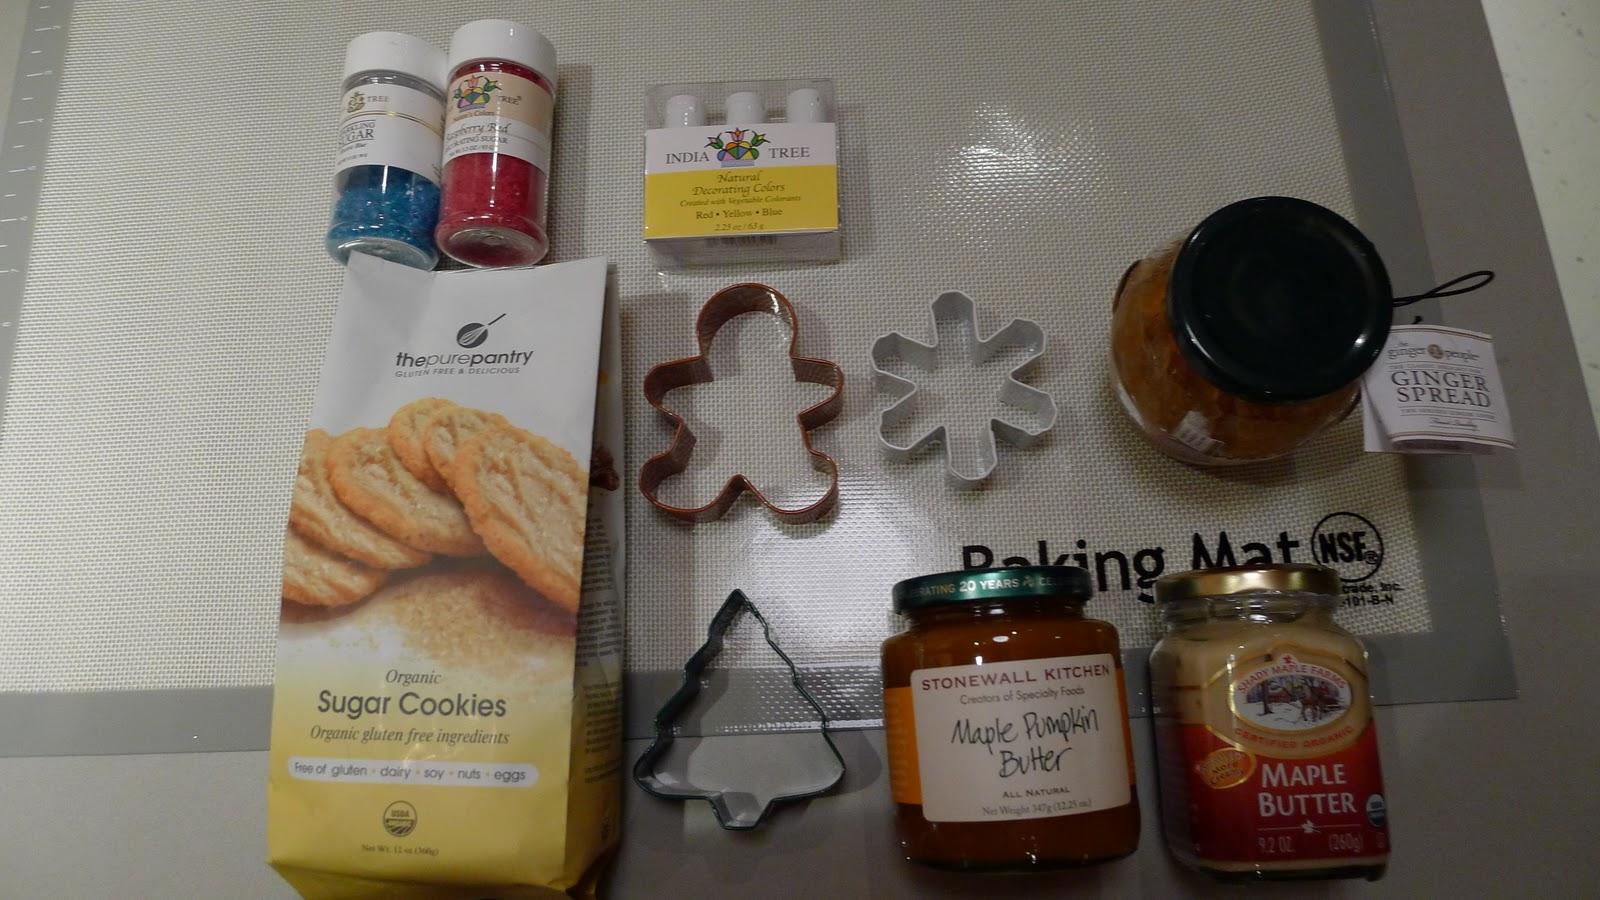 The Healthy Vegans: Fat Free Sugar Cookies